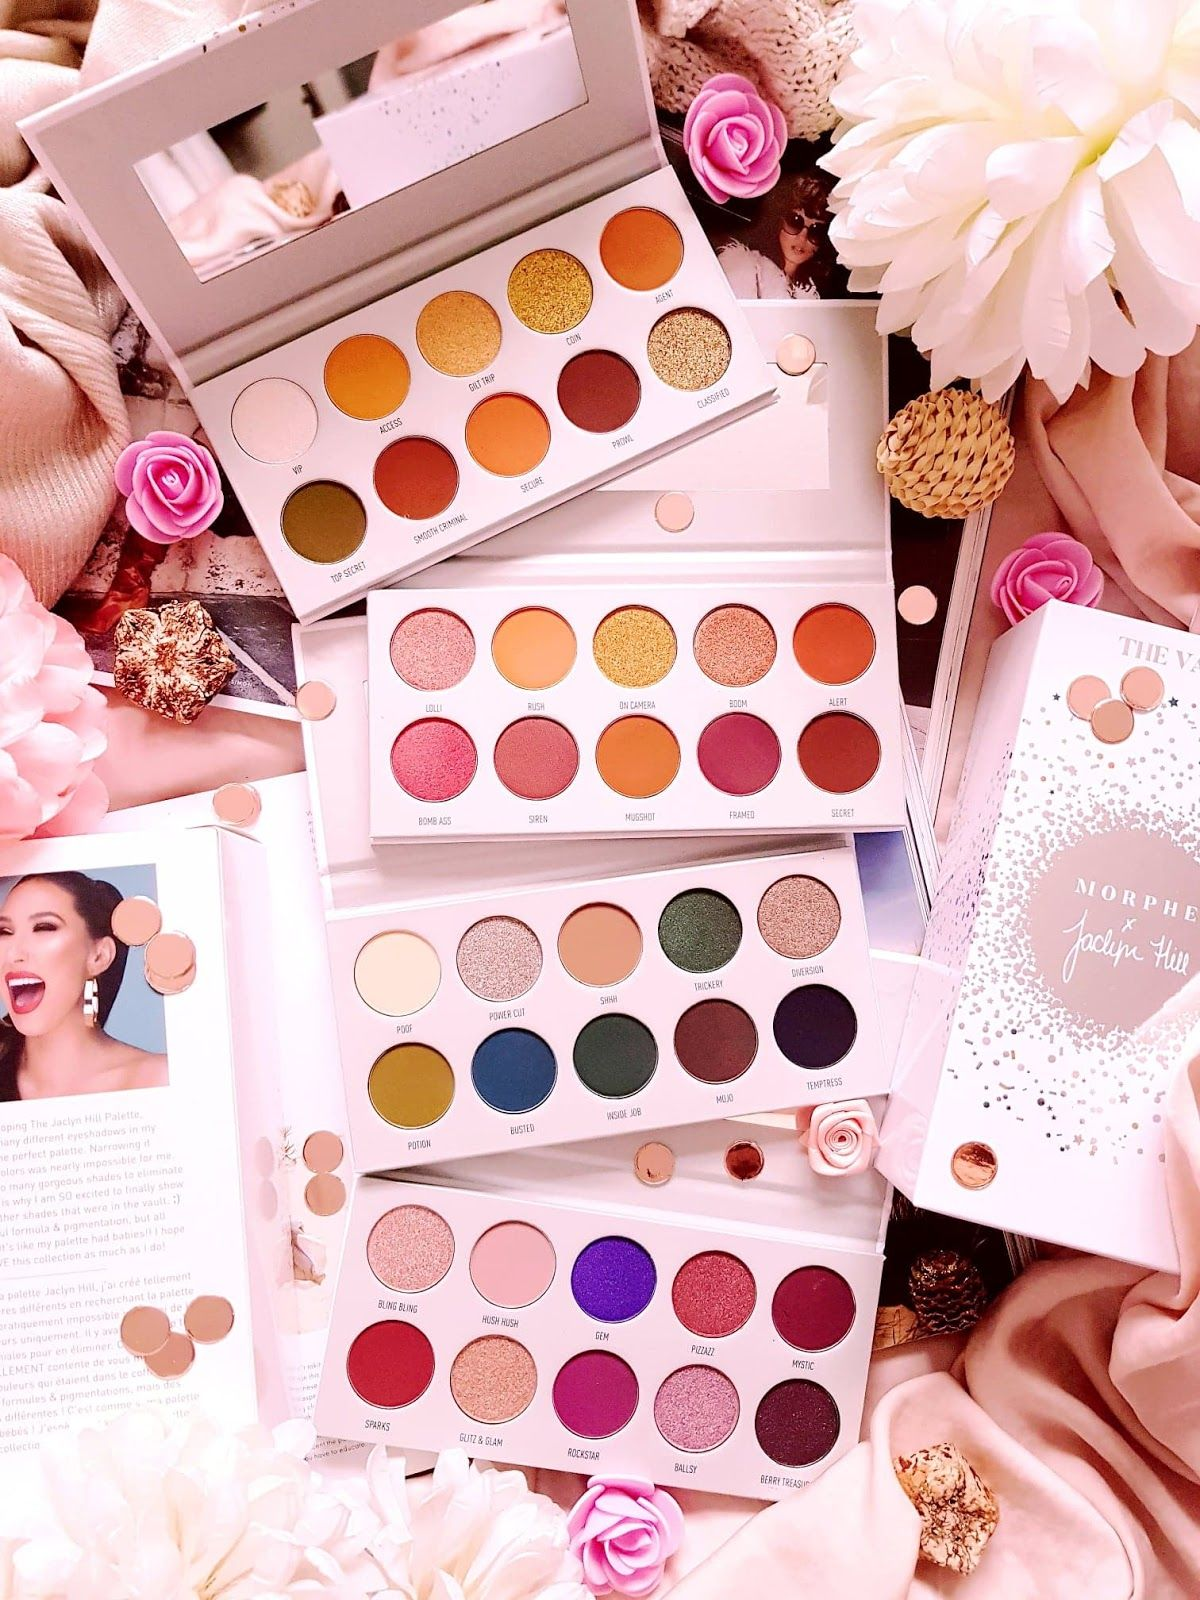 Morphe X Jaclyn Hill Jaclyn hill makeup, Kylie cosmetics